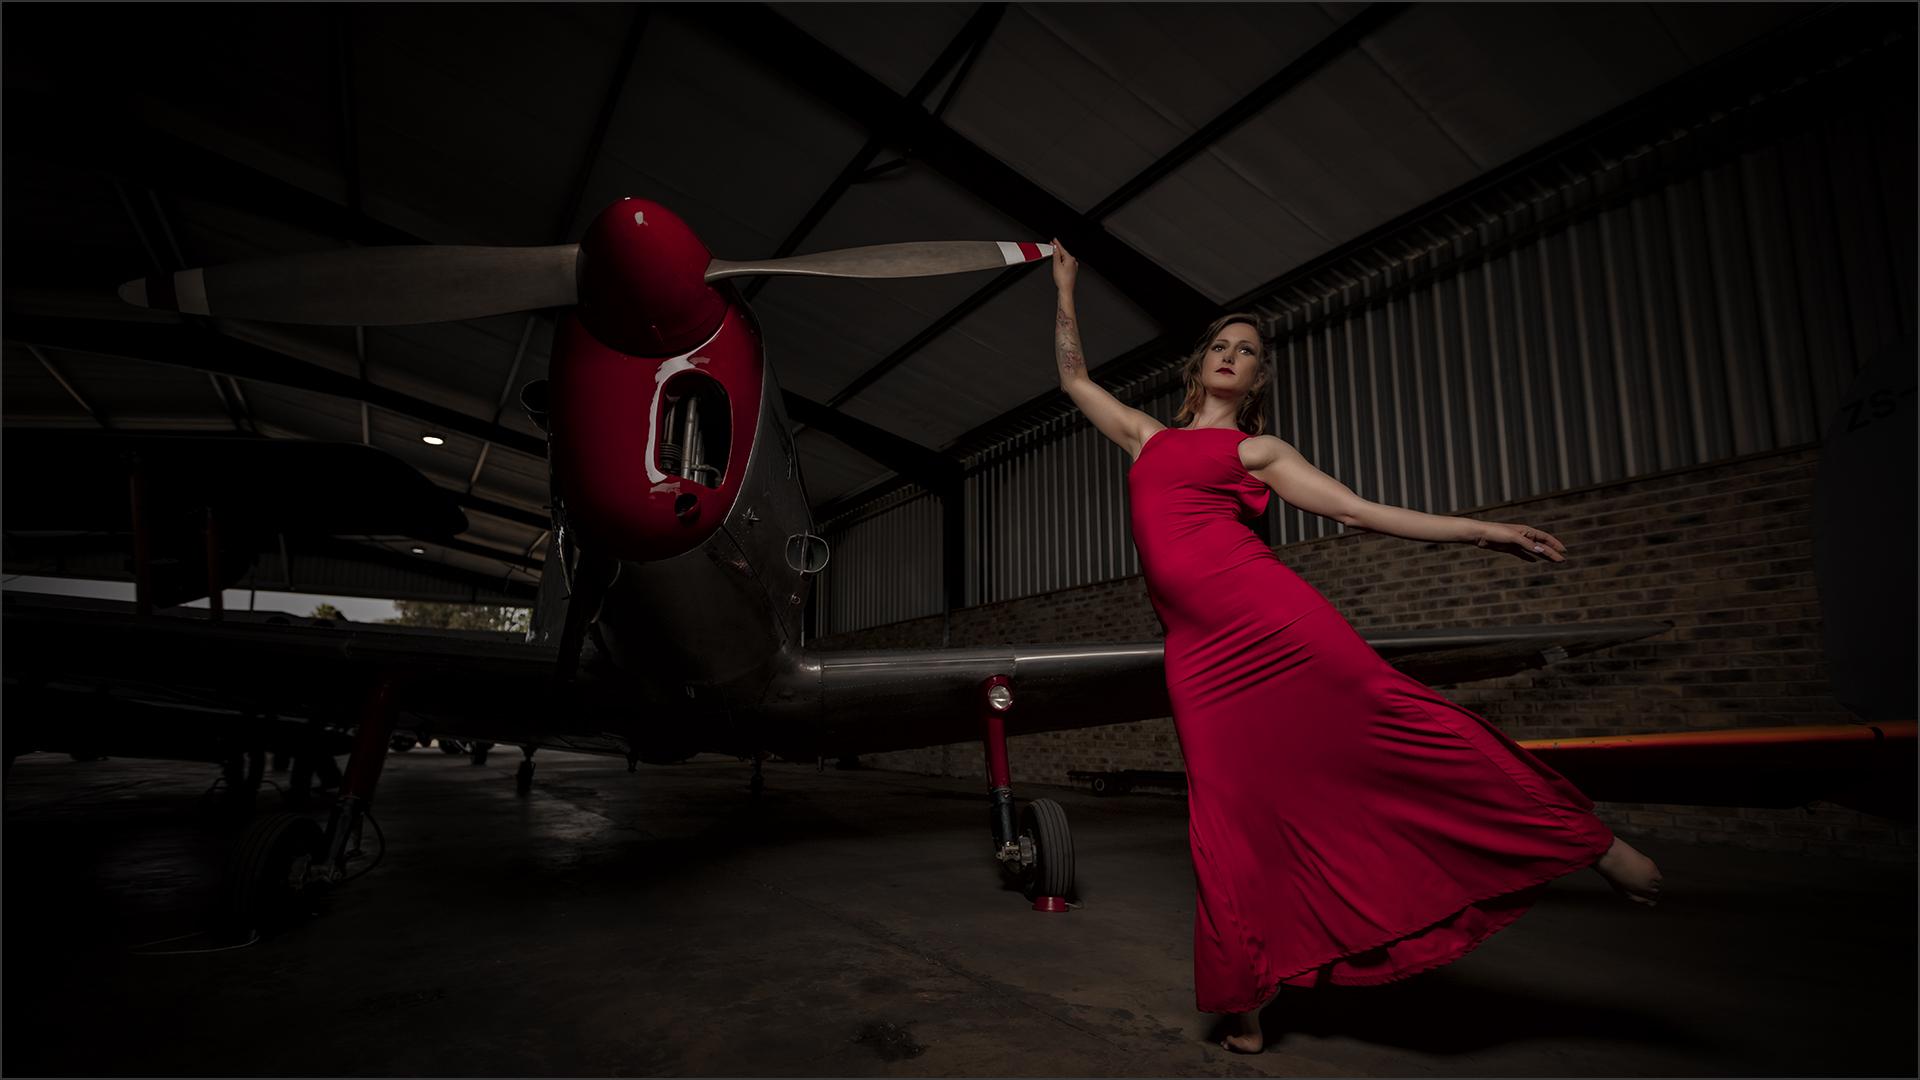 Red Plane Dancer-Simon Fletcher